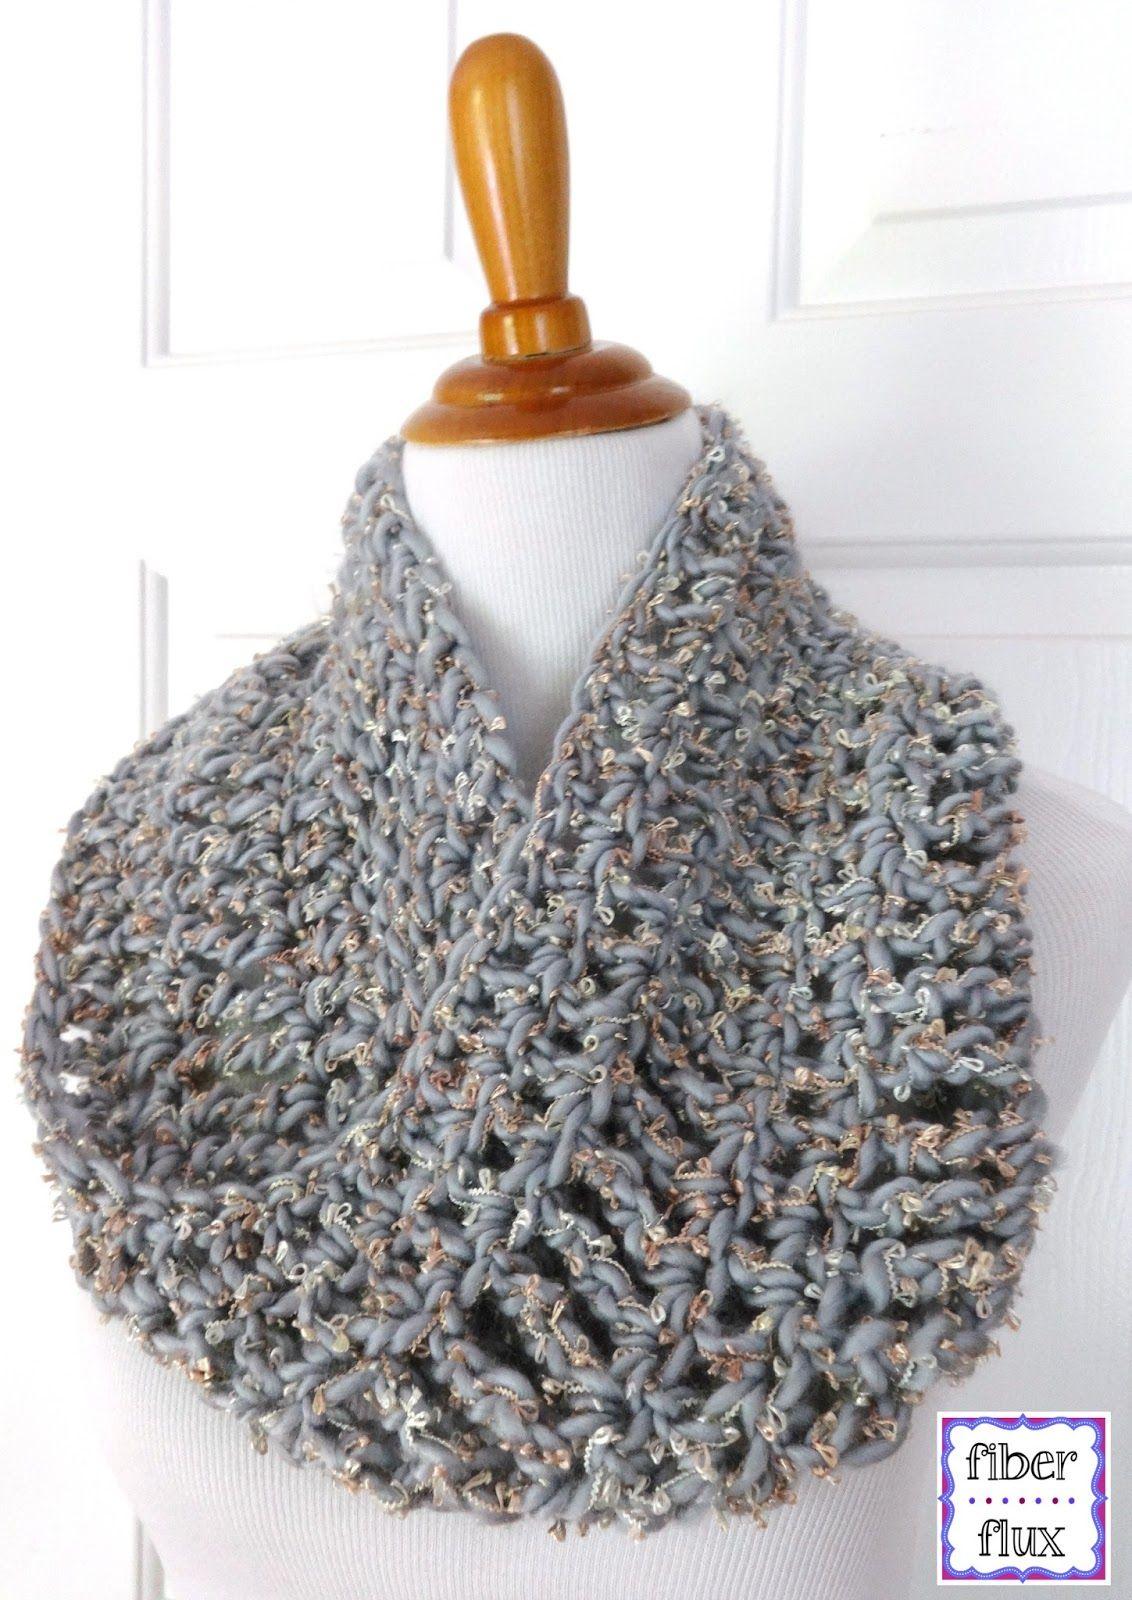 Pin de Janice Brown en crochet/knitting | Pinterest | Collares